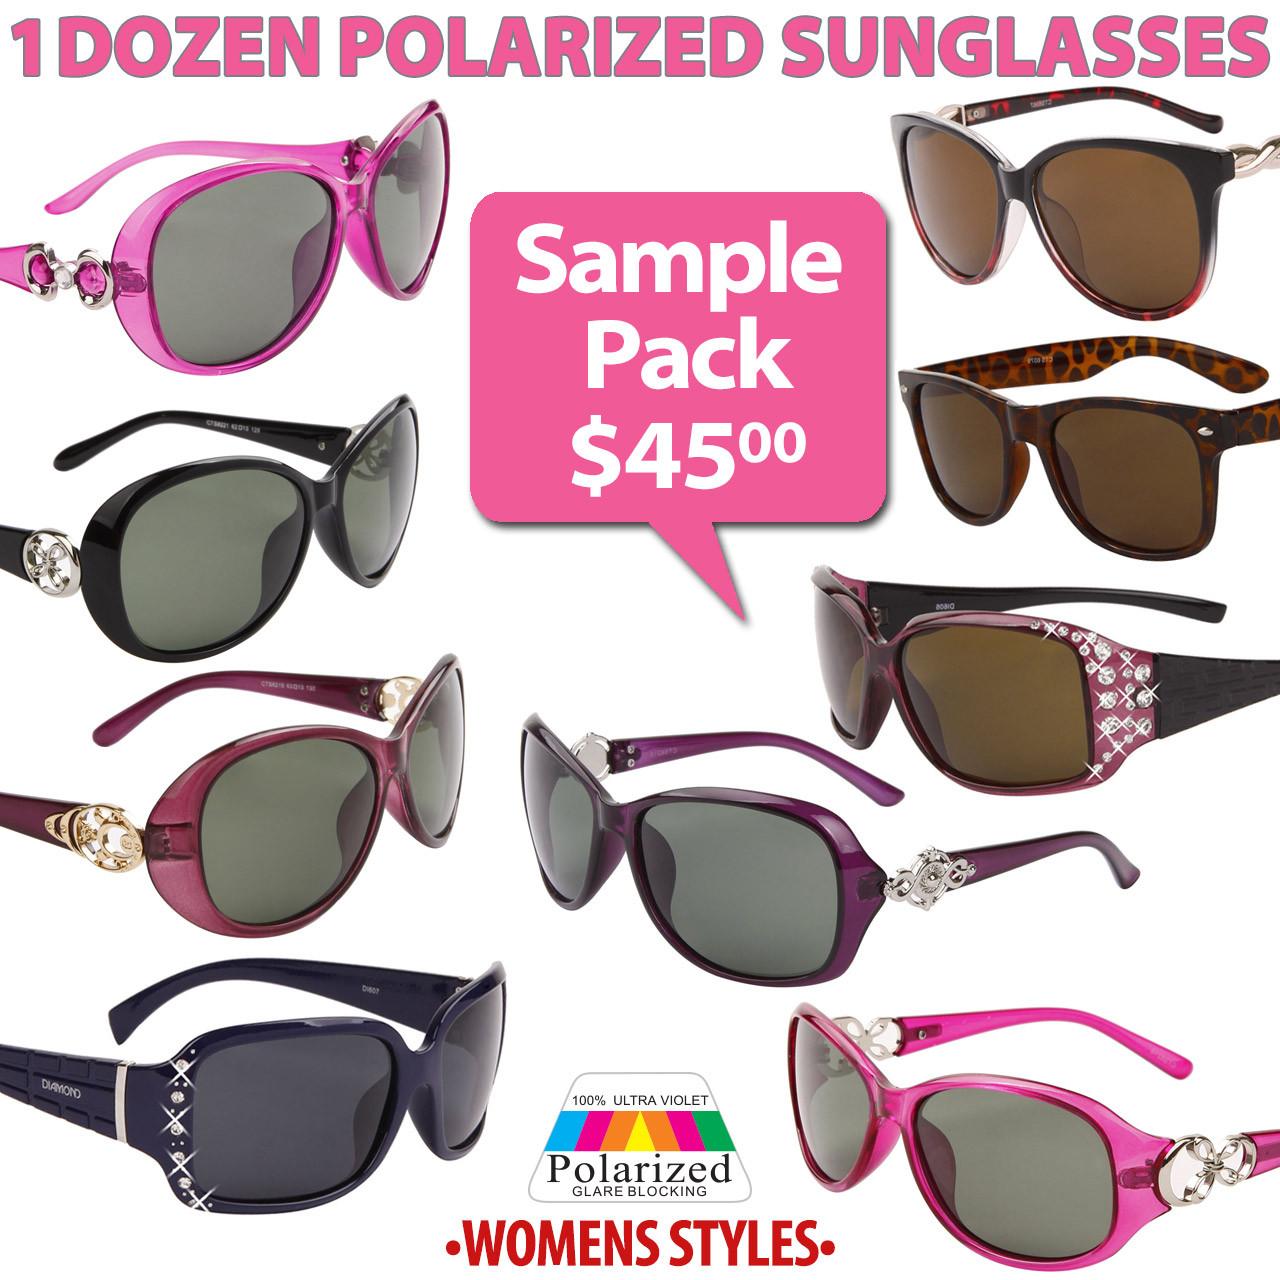 Polarized Sunglasses Sample Pack SPA-PW Women's Styles